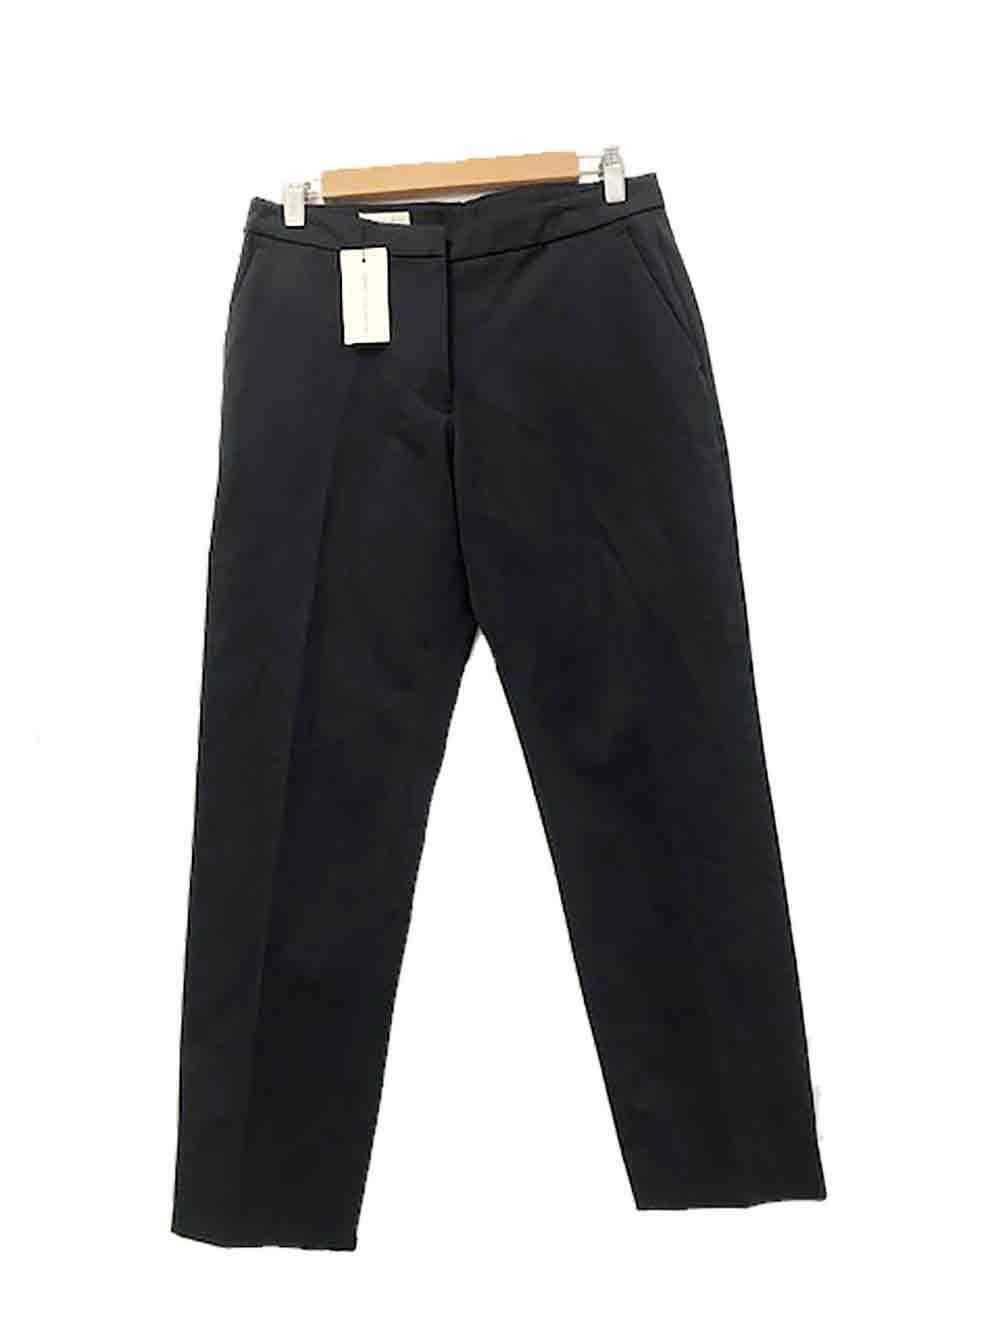 Designer BNWT Dries Van Noten Size 36 8 AU Navy bluee Cotton Women's Pants